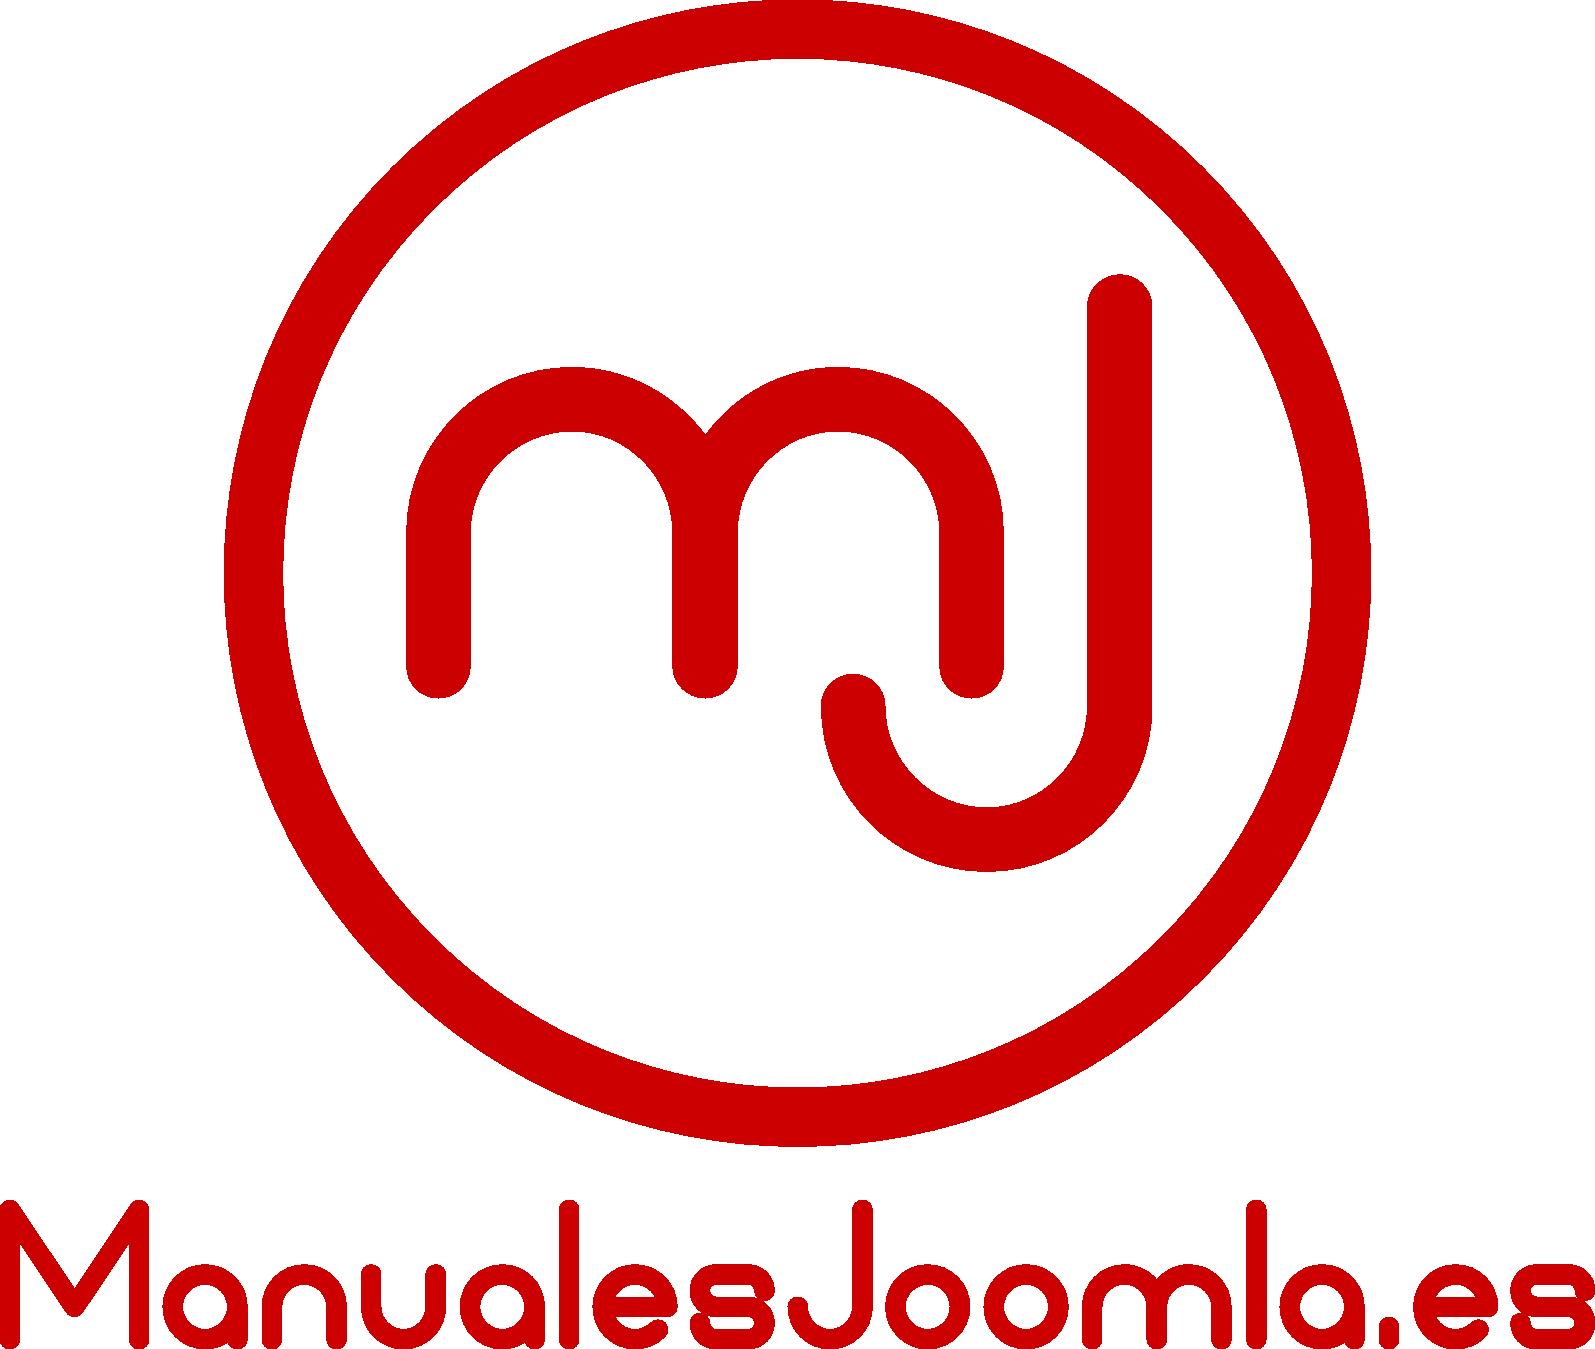 ManualesJommla